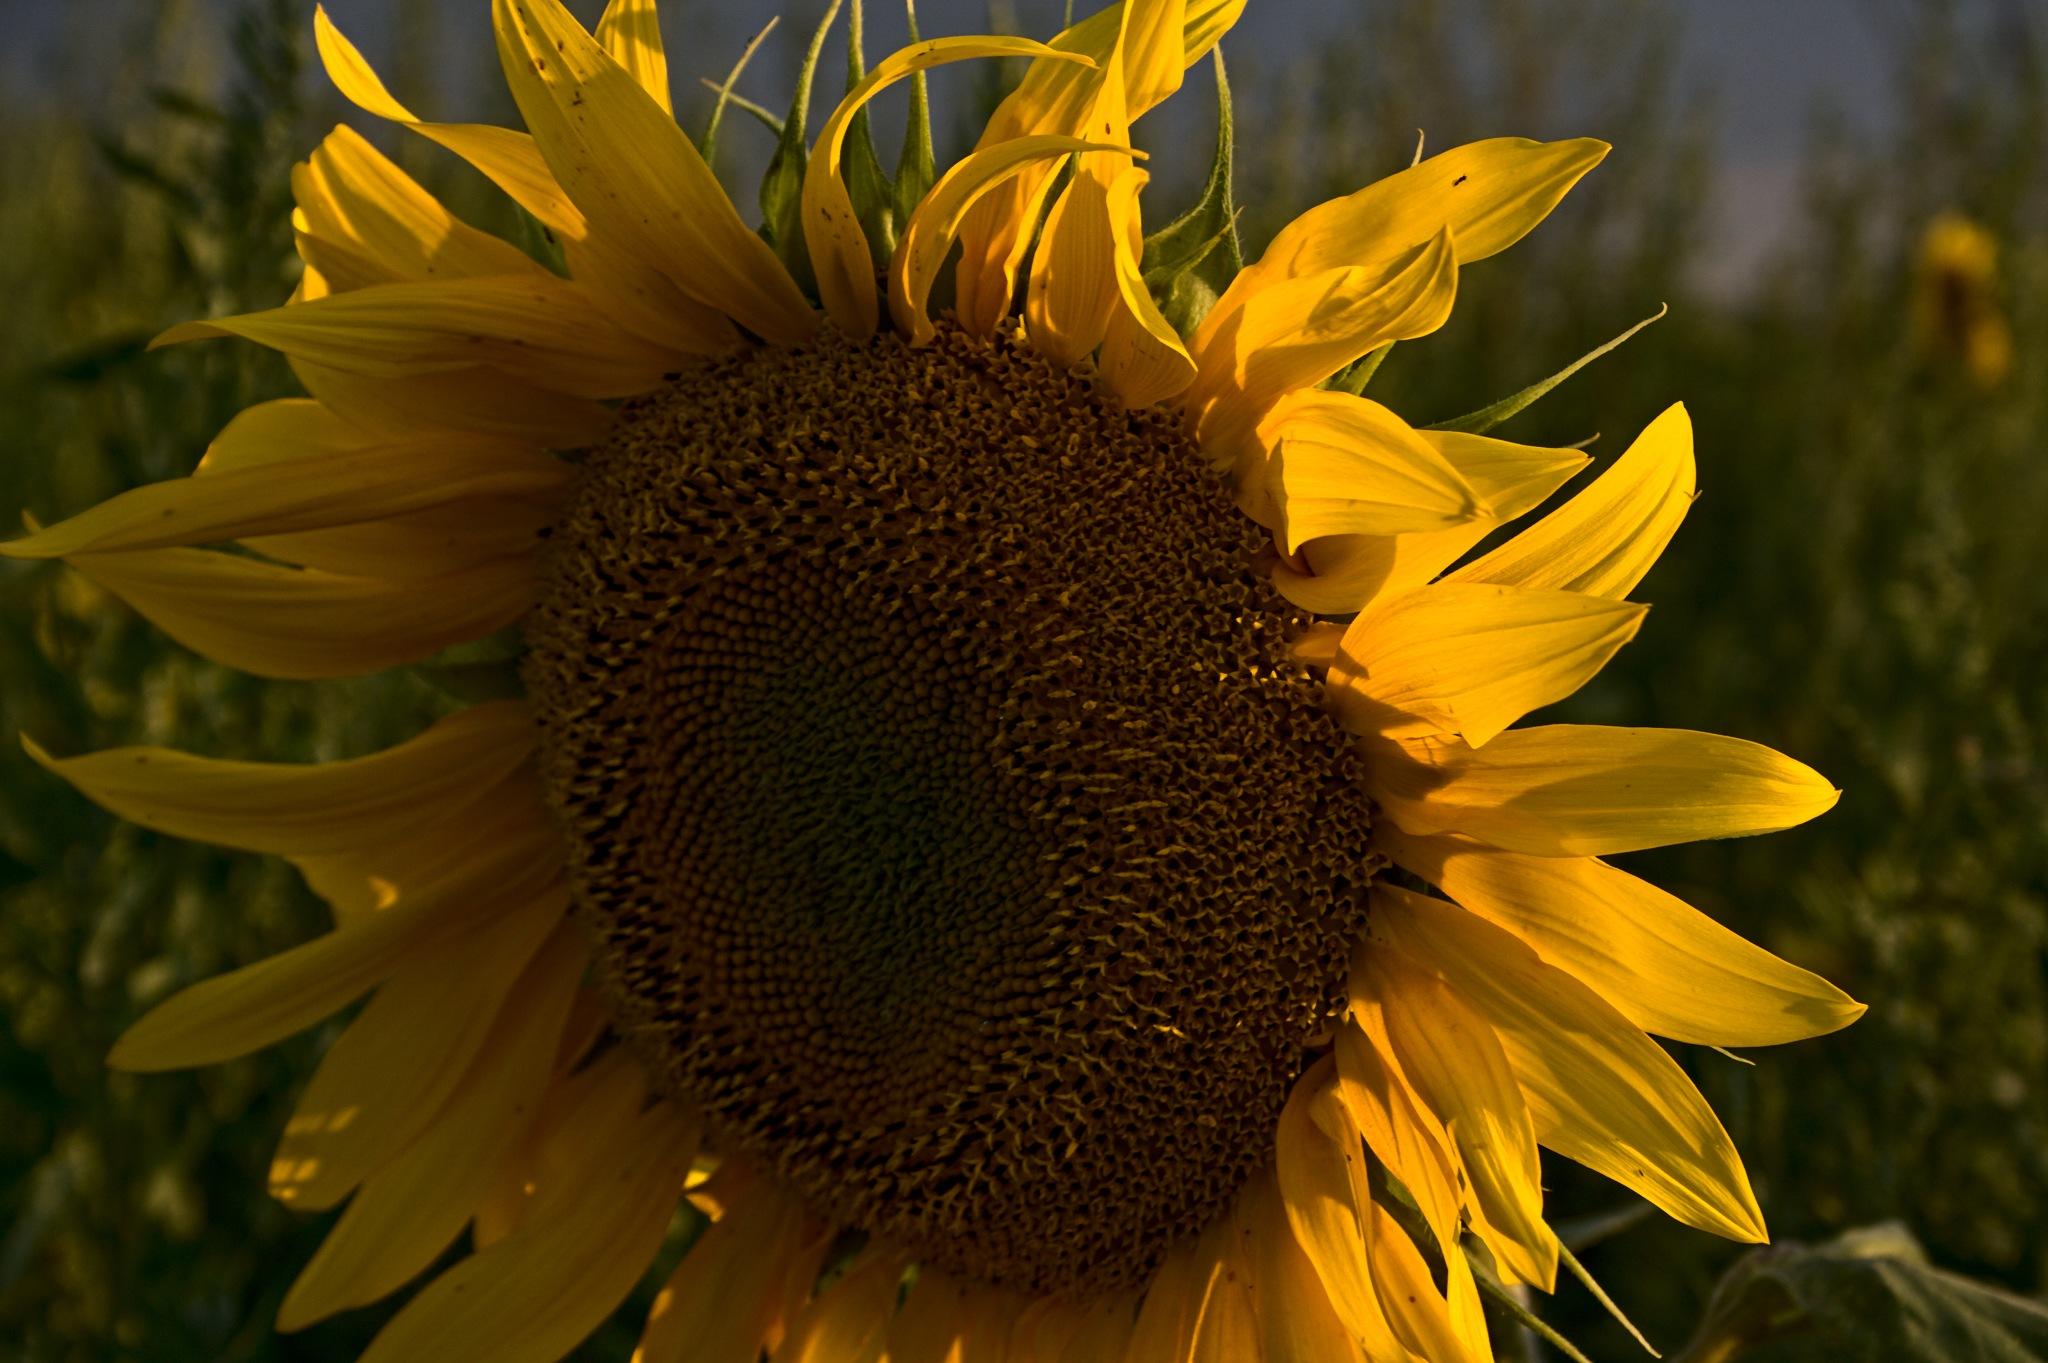 Sunflower by Евгений Козлов